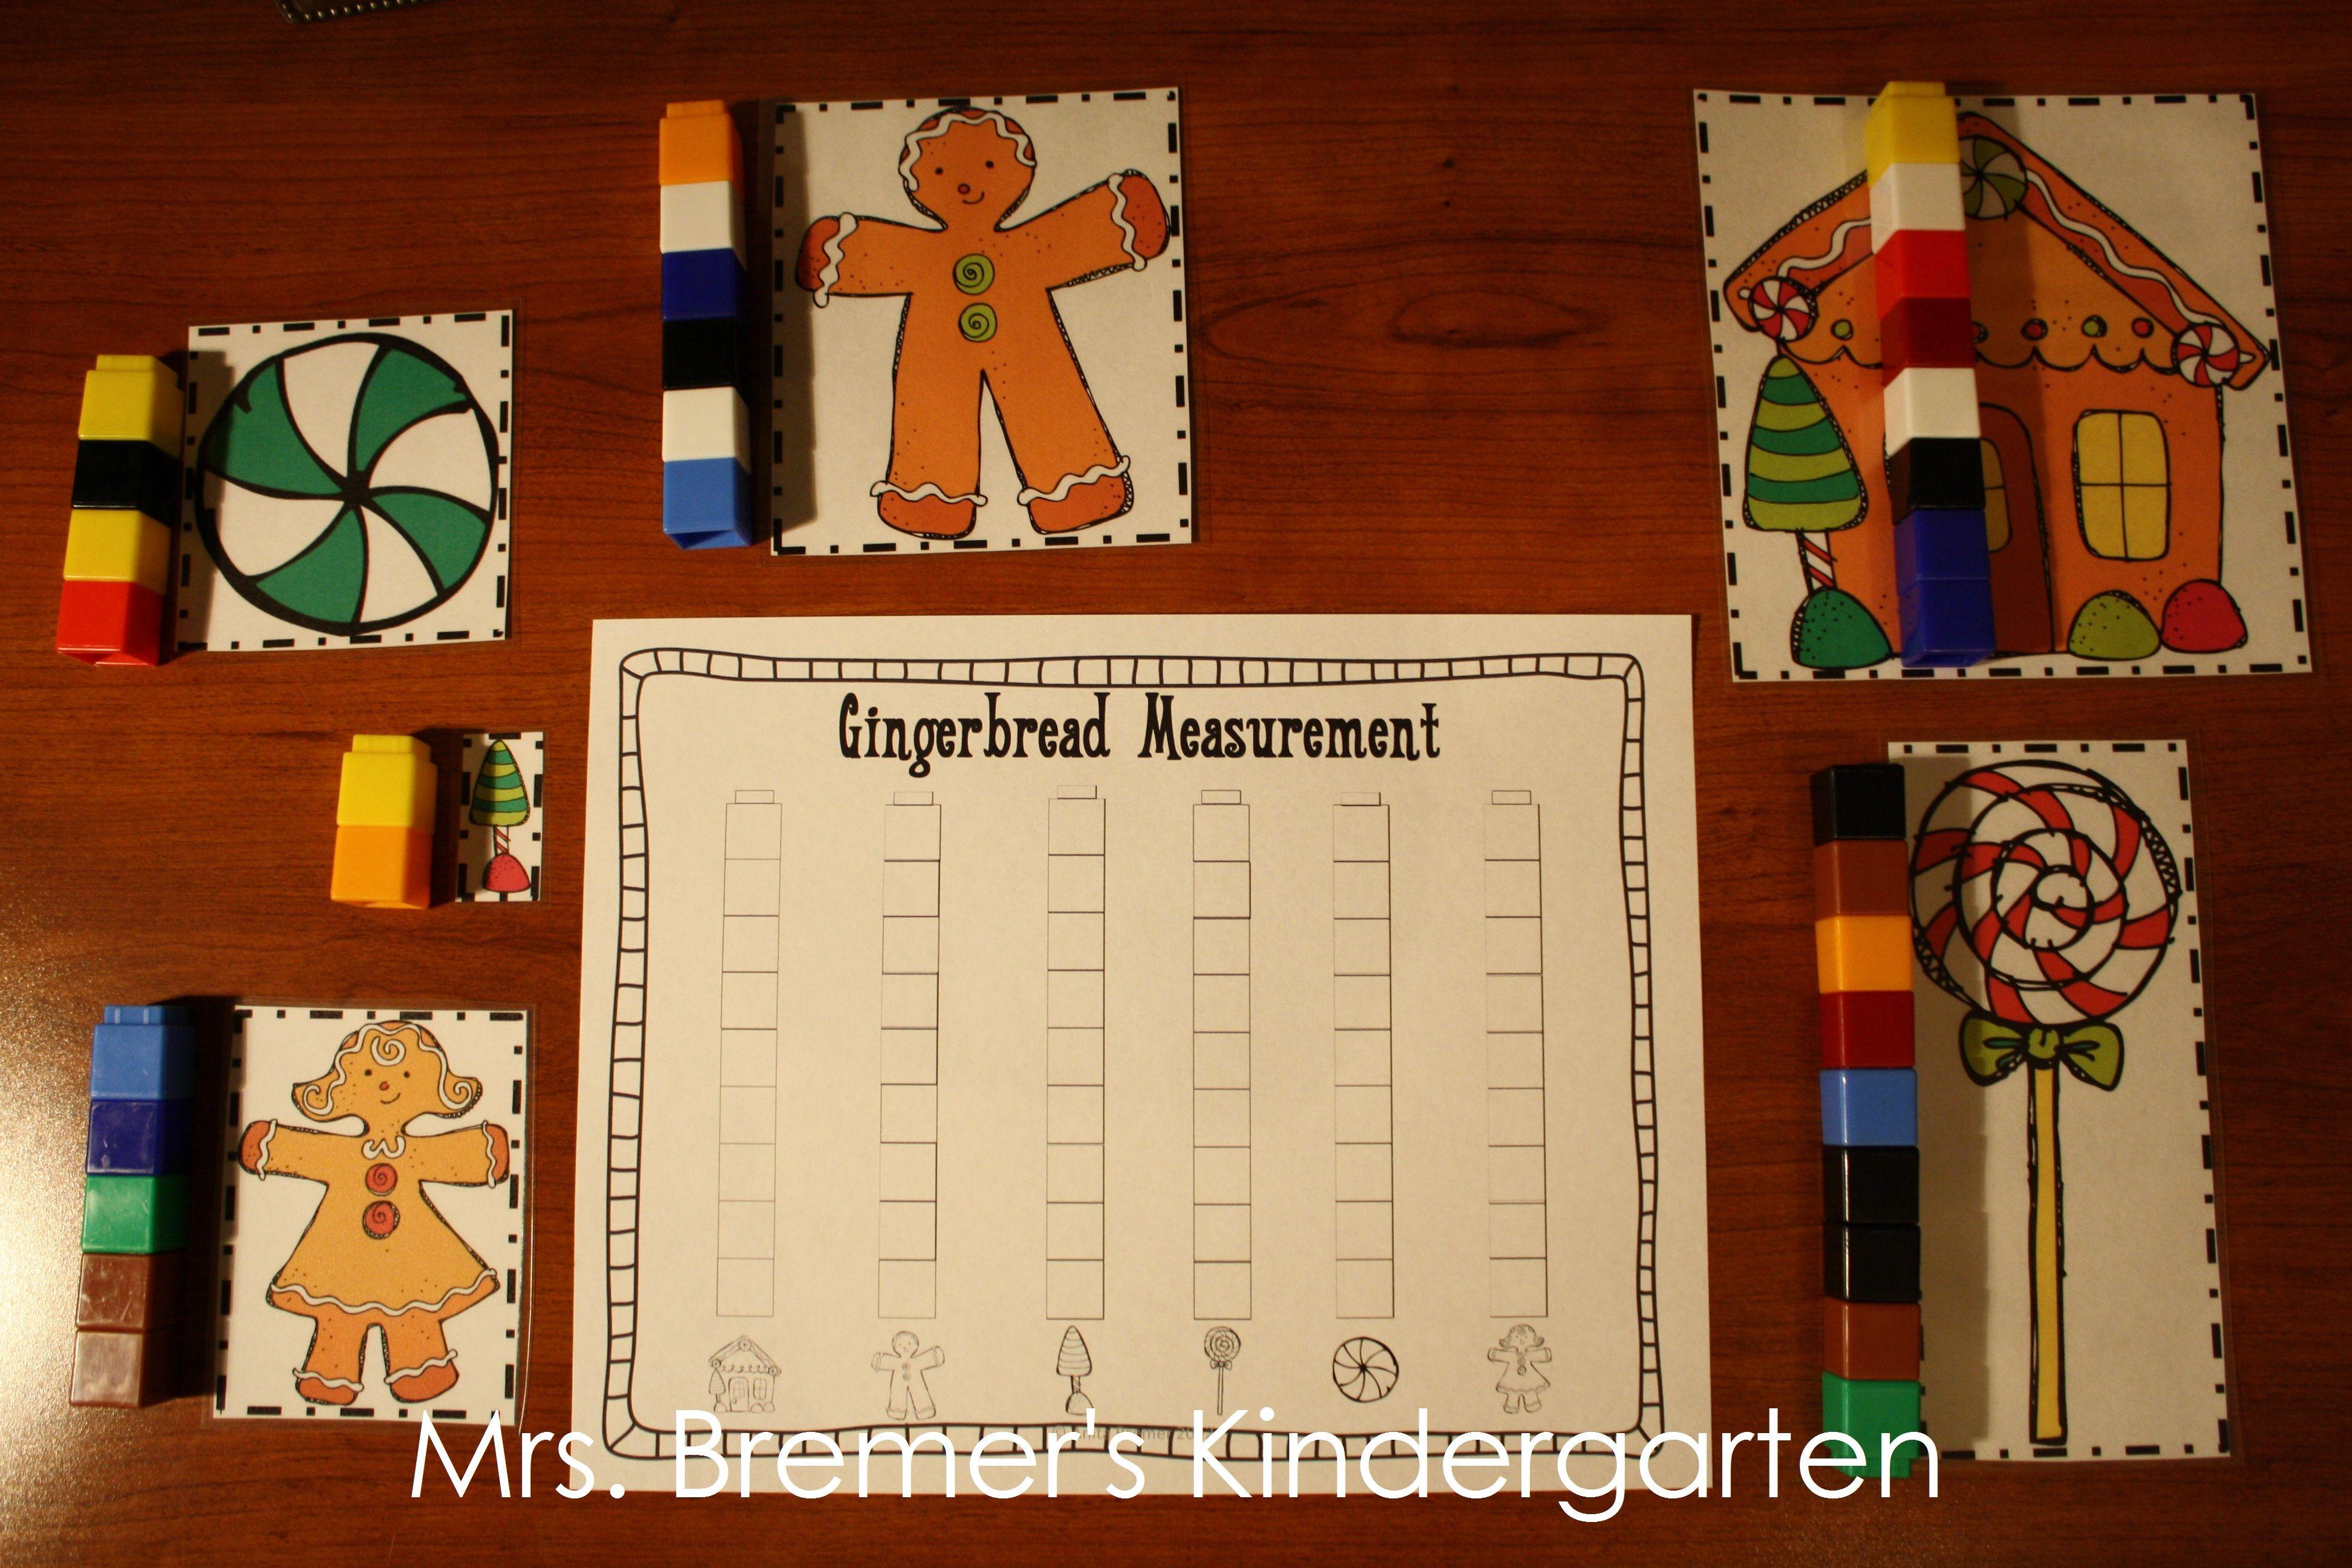 Gingerbread Man Measurement Activities Using Unifix Cubes